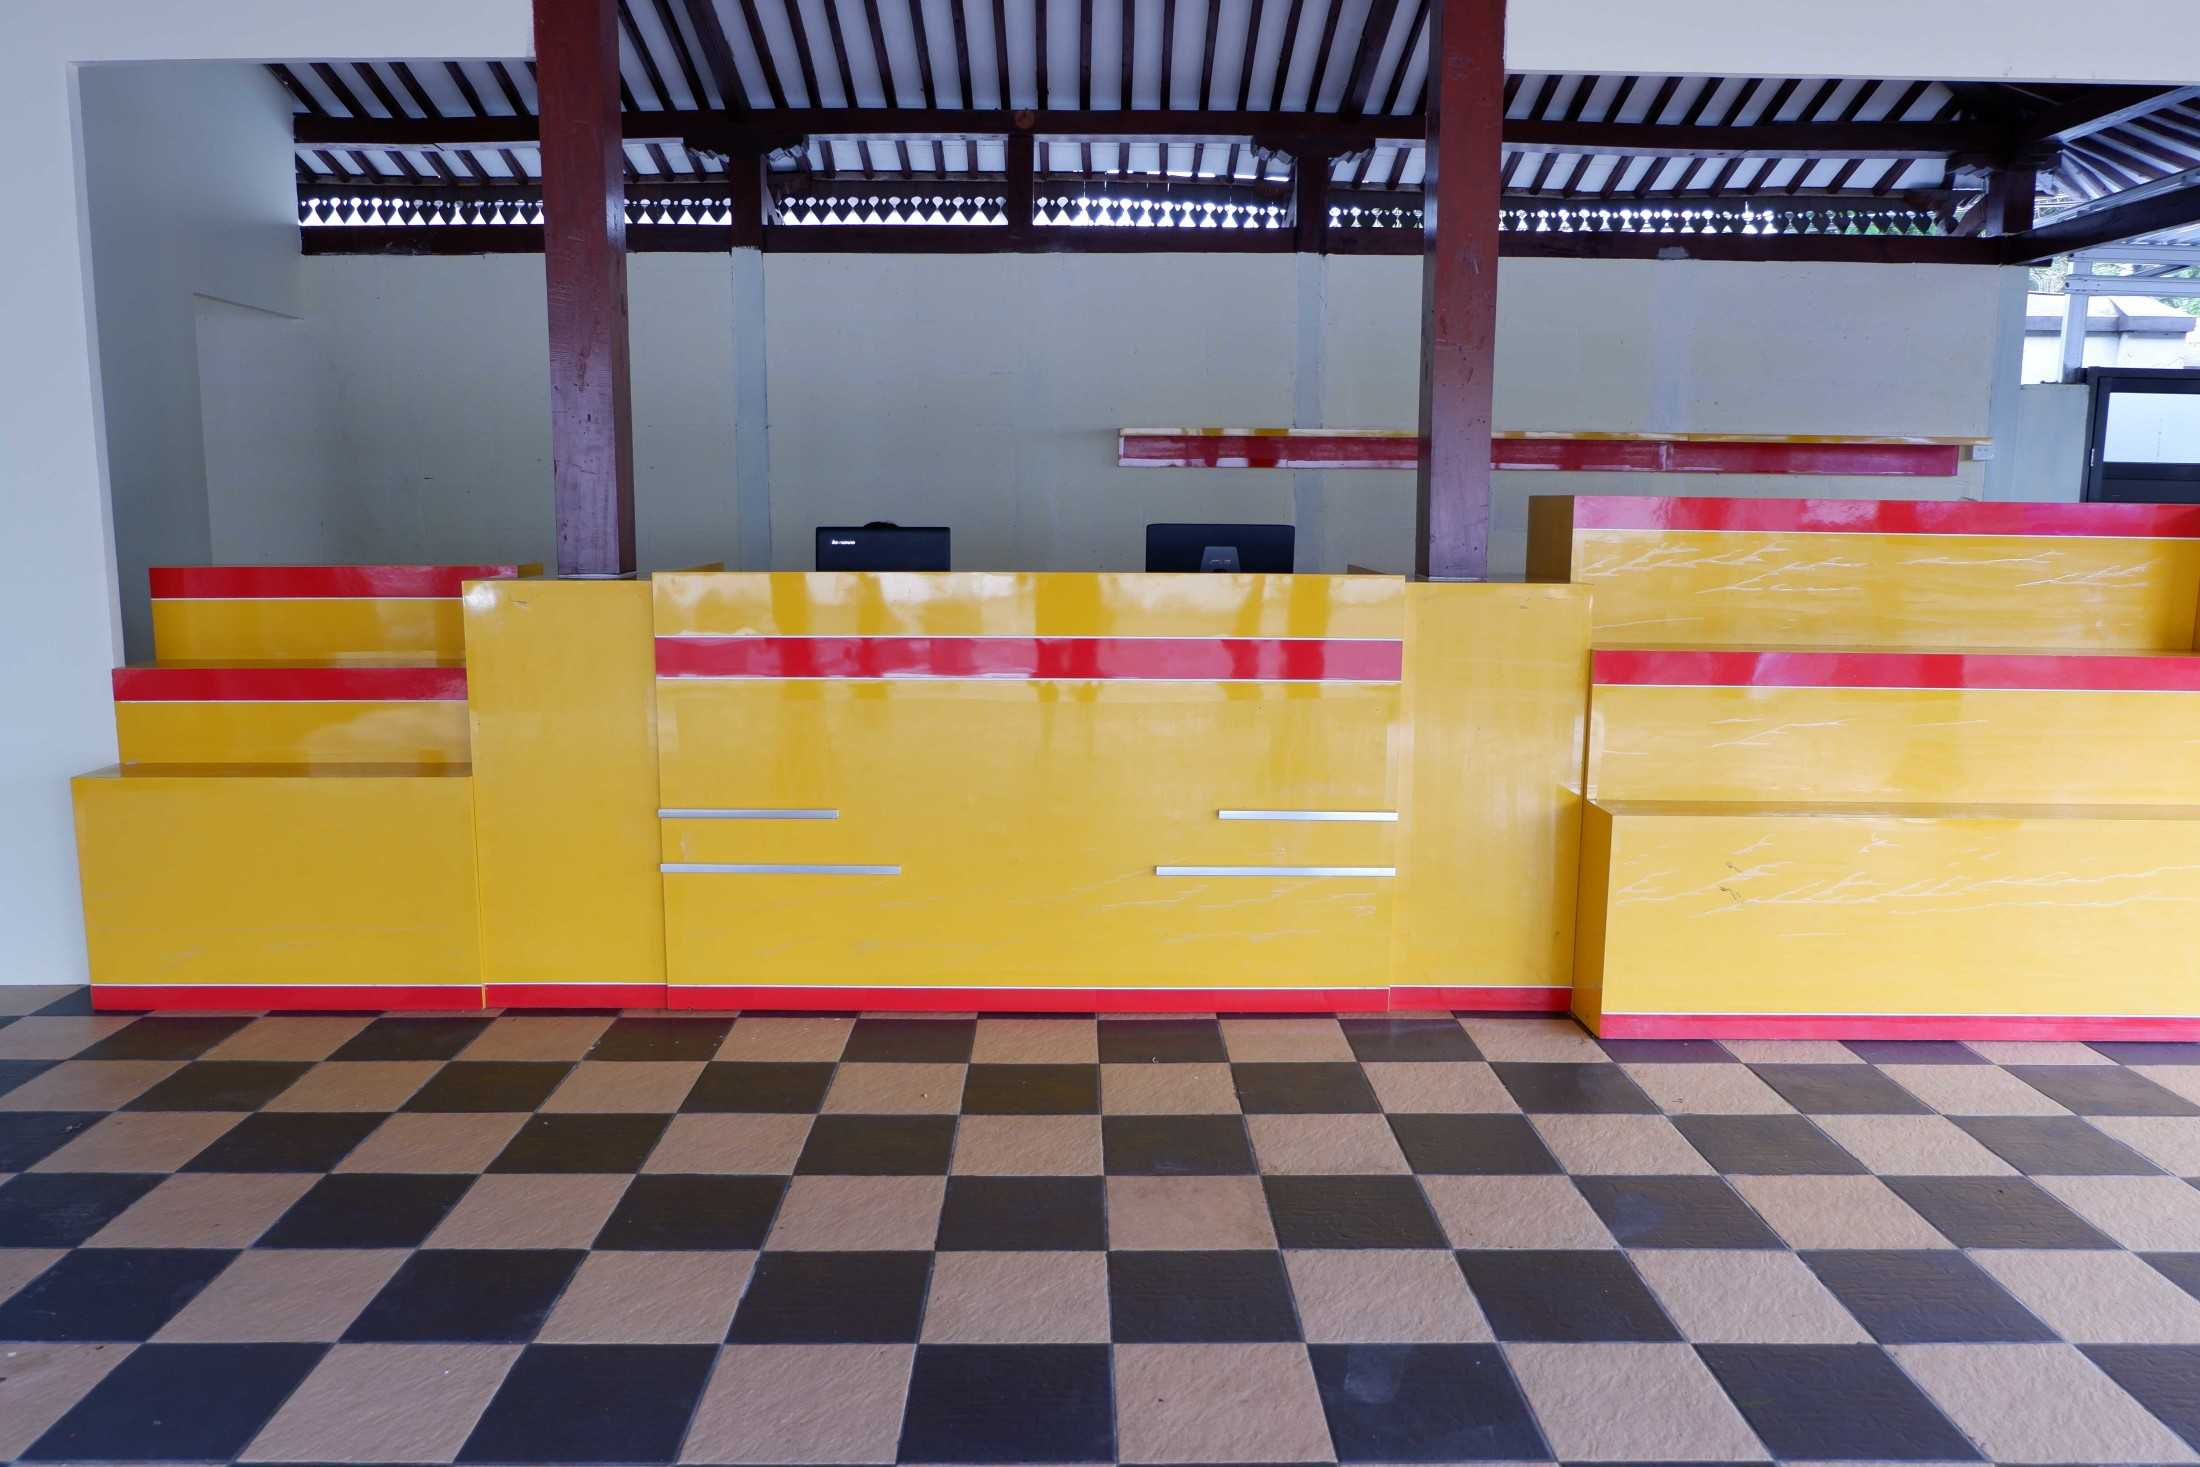 Jasa Design and Build RD Architeam di Yogyakarta